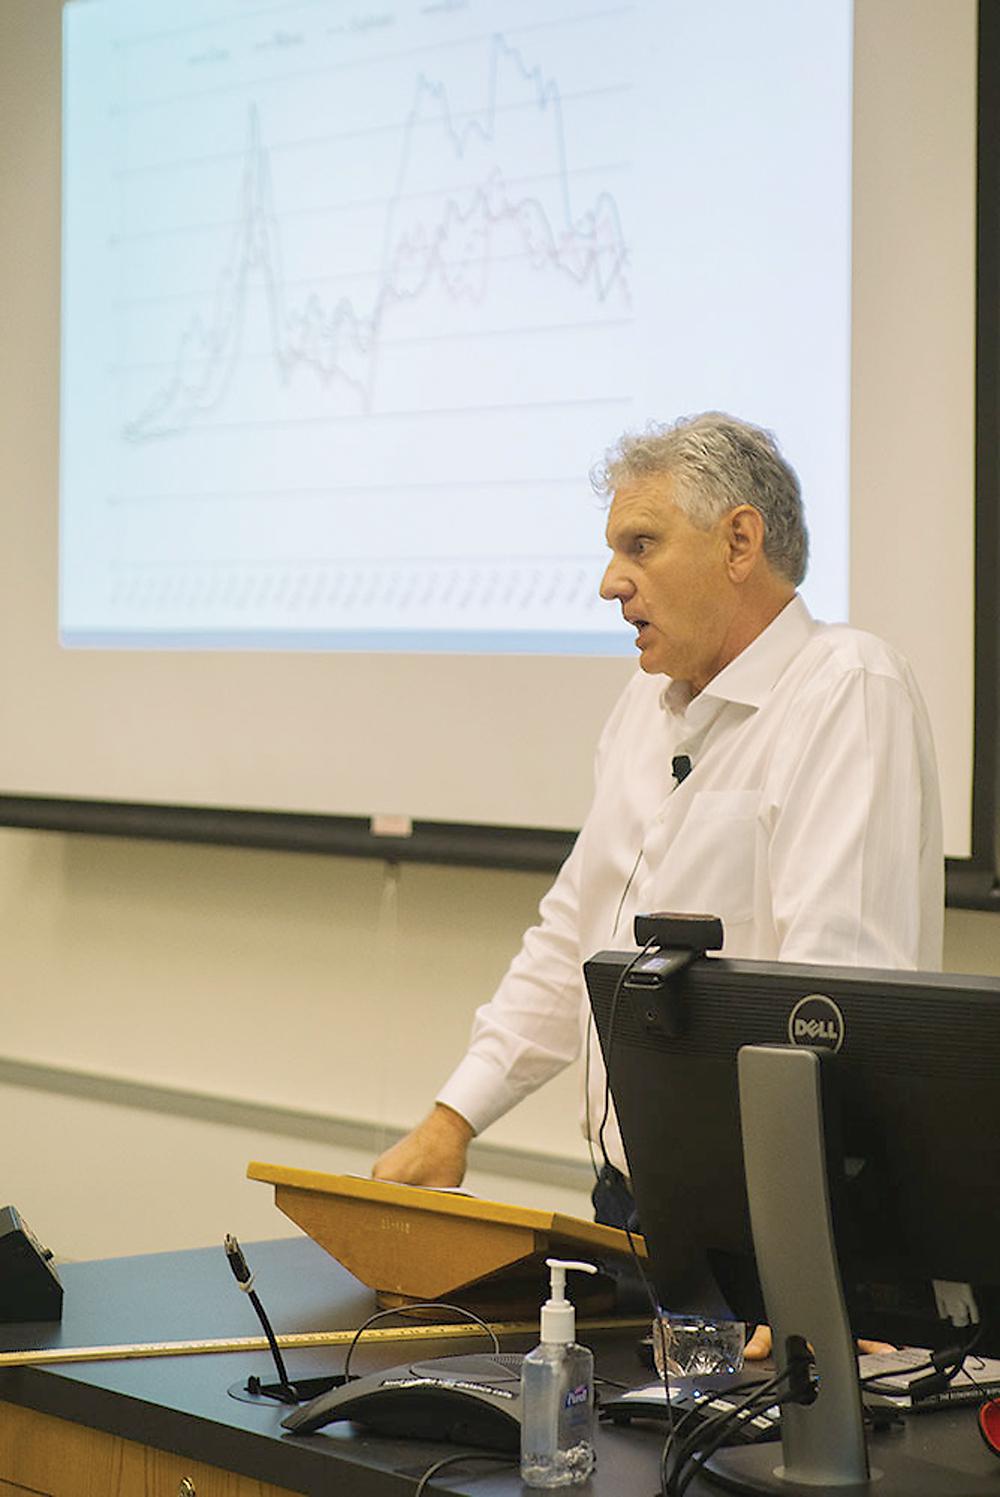 Prof. Harry de Gorter talks about the reason for rising corn prices at a book talk at Mann Library Thursday.  (Cameron Pollack / Sun Senior Photographer)